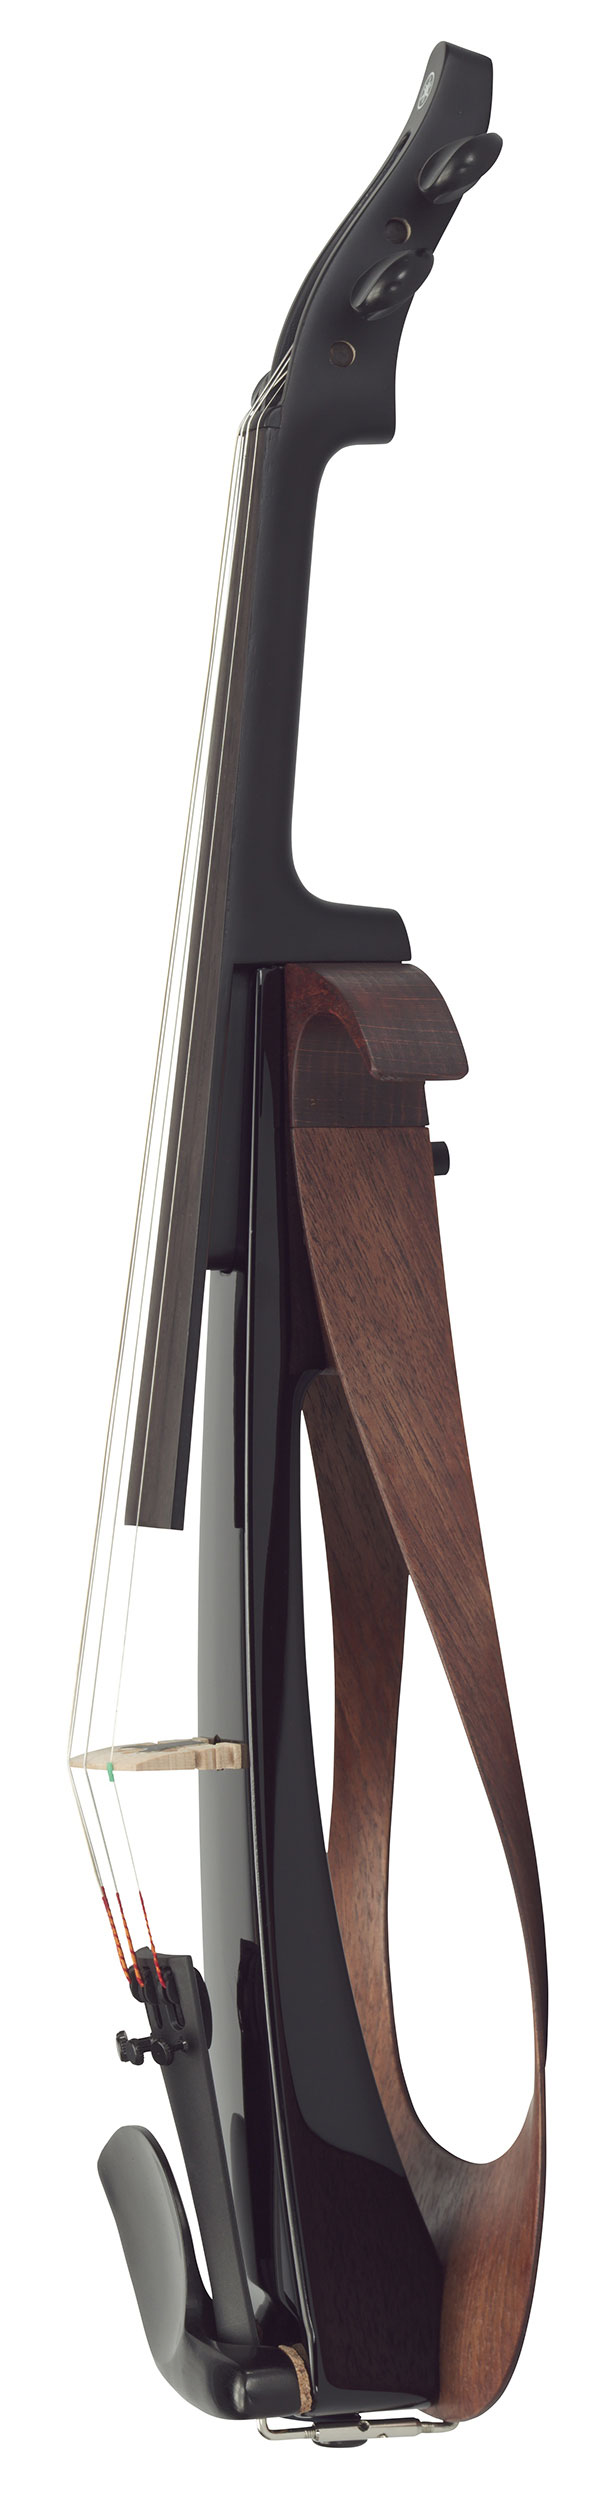 Yamaha Yev 104 Electric Violin Full Size Four String Violin In Black Finish Yamaha Music London